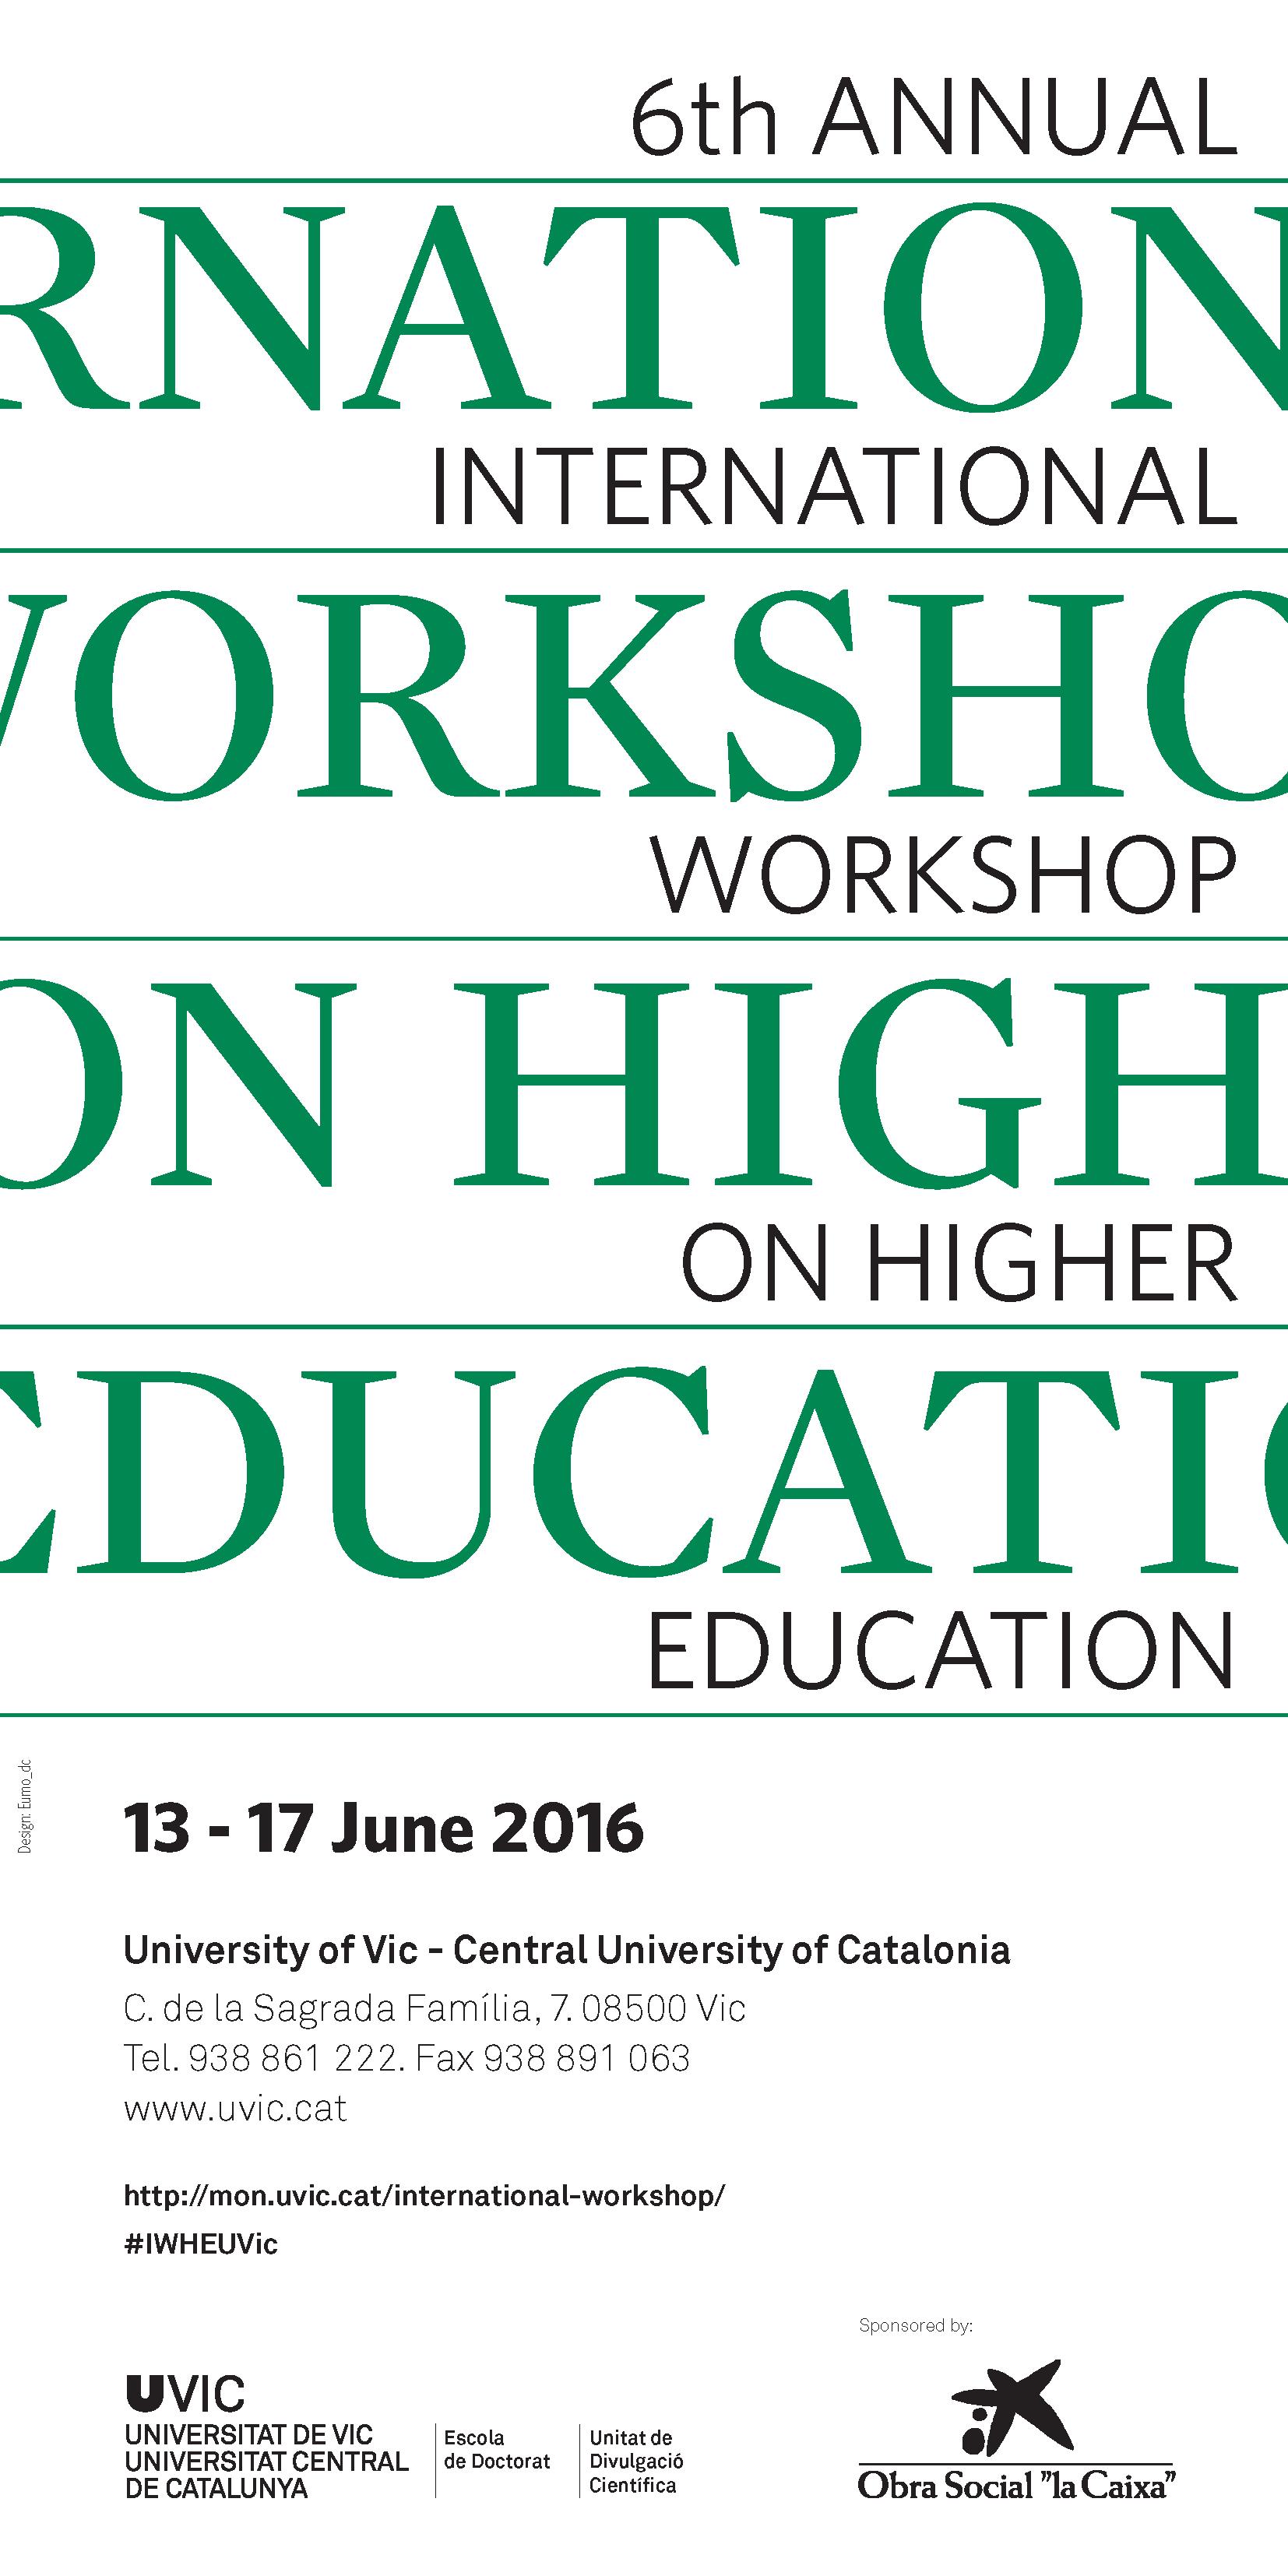 Workshop Cartell 2016